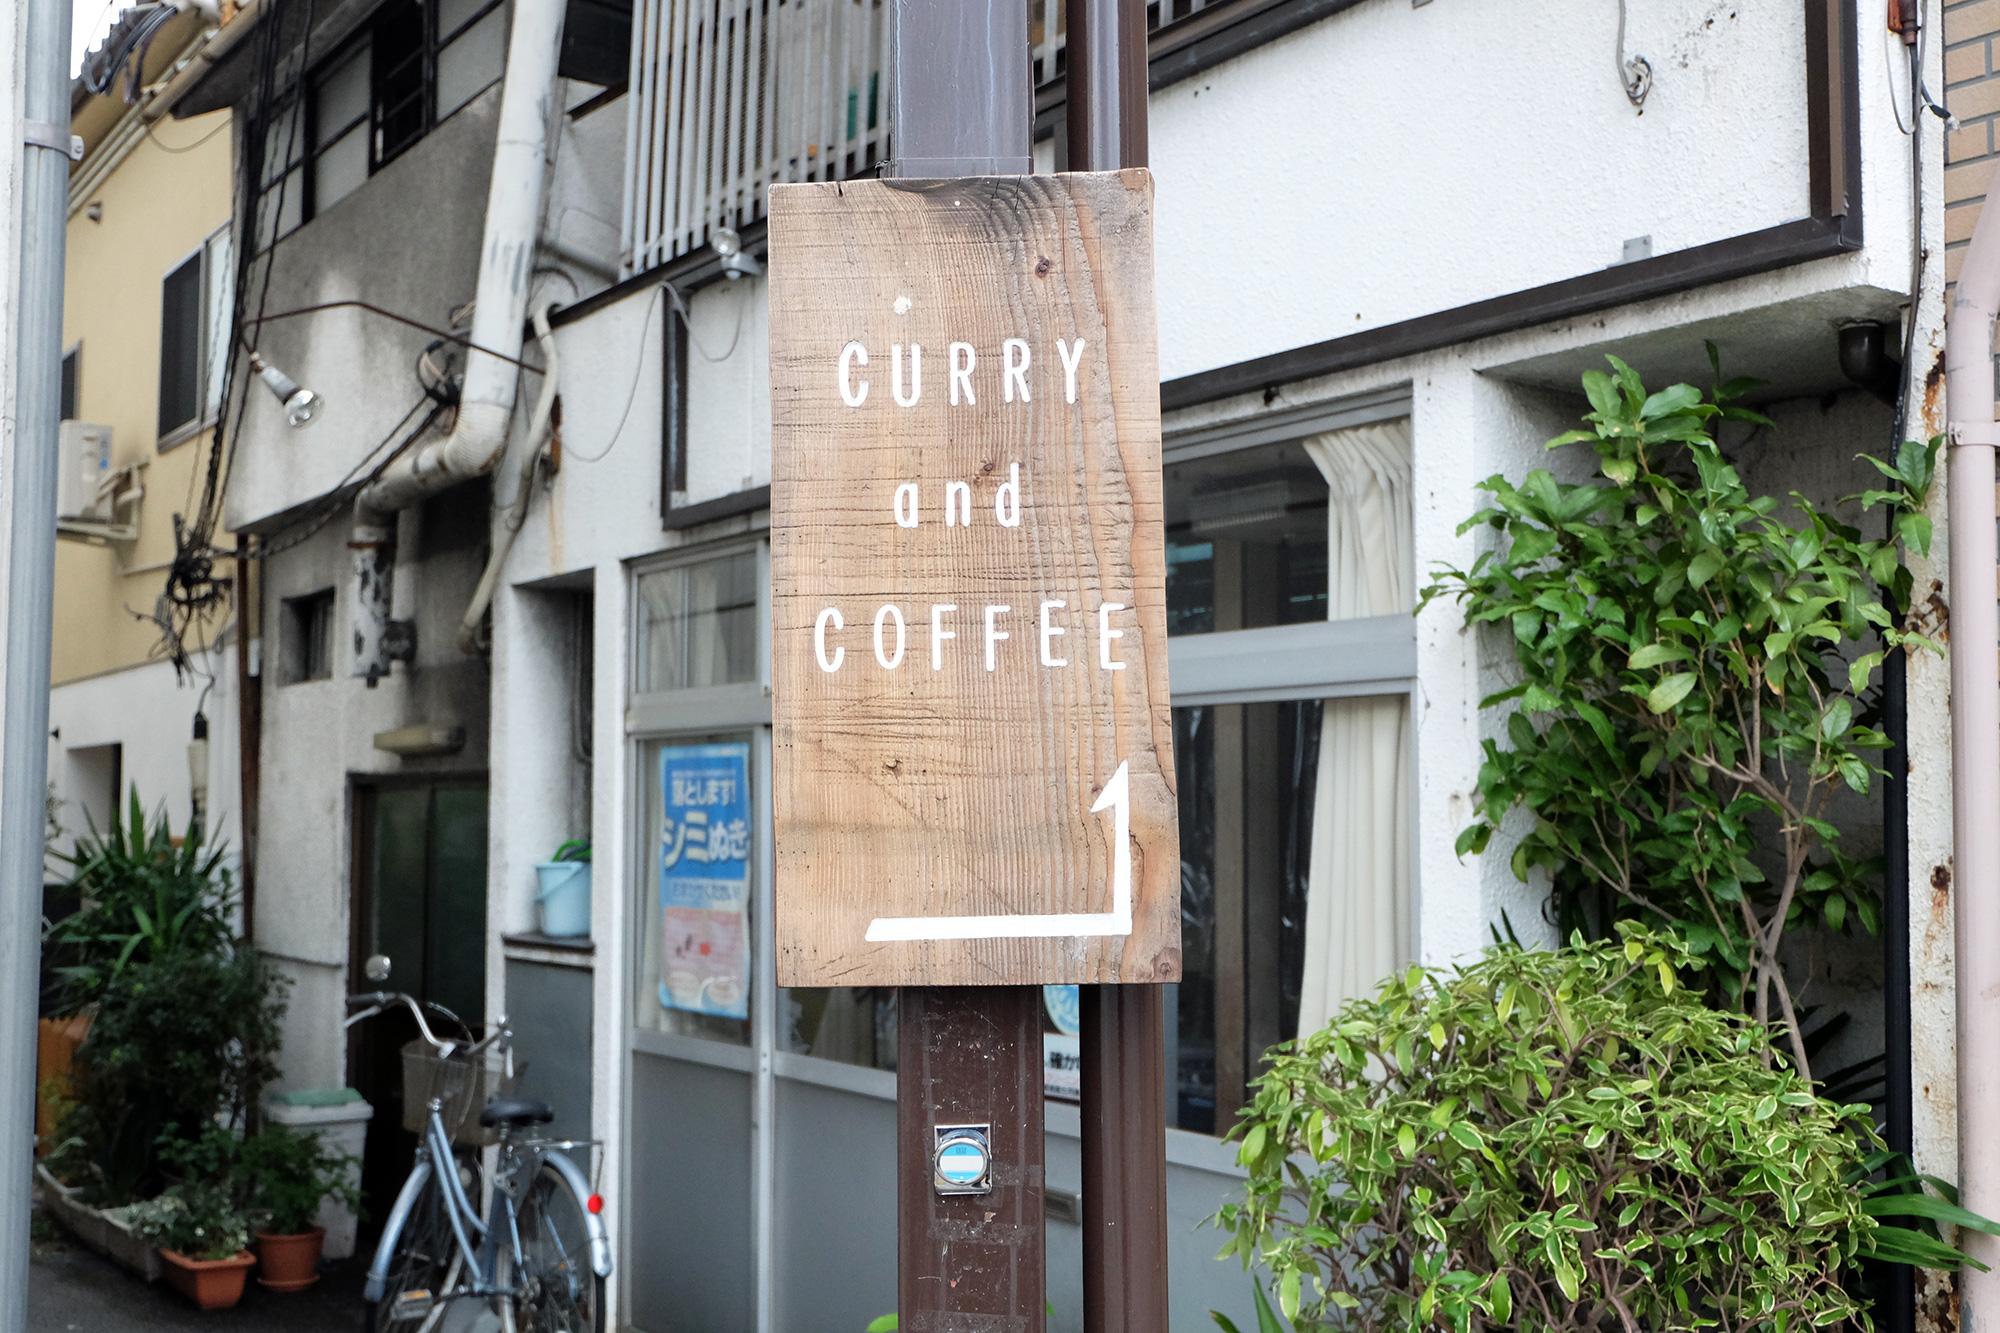 asipai + HIBICOFFEE KYOTO (アジパイ+ヒビコーヒー) - 京都・七条